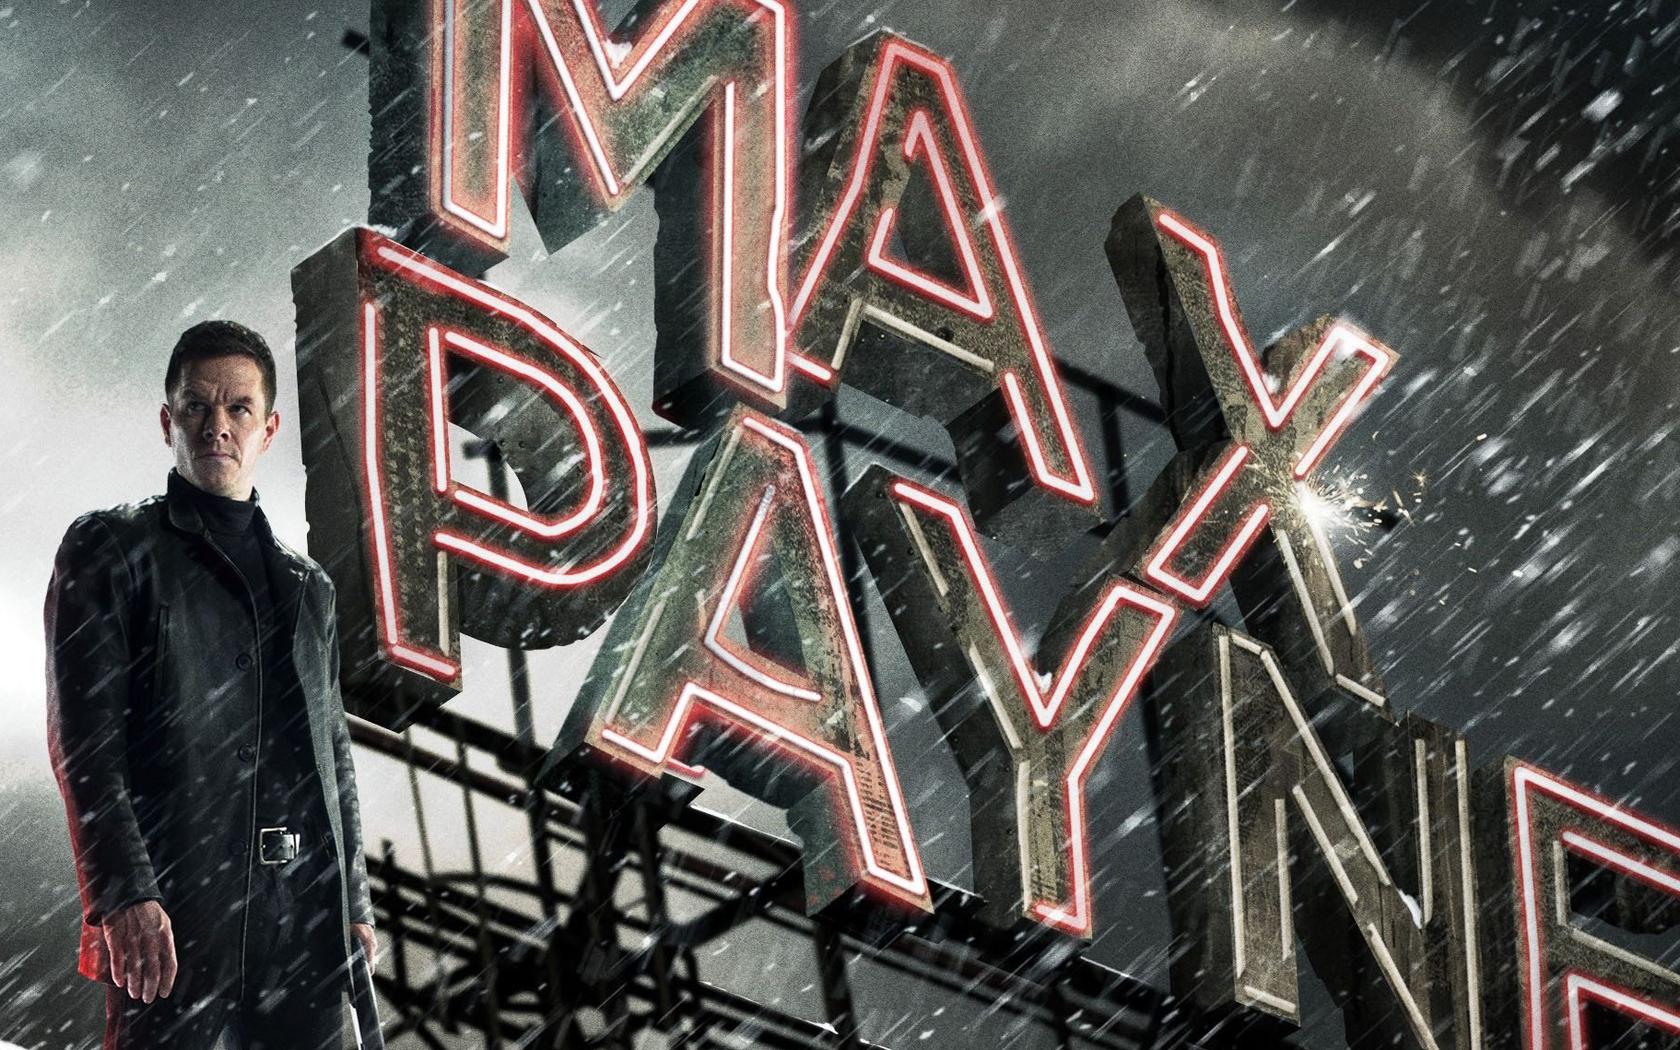 Popular Wallpaper Movie Max Payne - Movies_Films_M_Max_Payne_031983_  Snapshot_193264.jpg